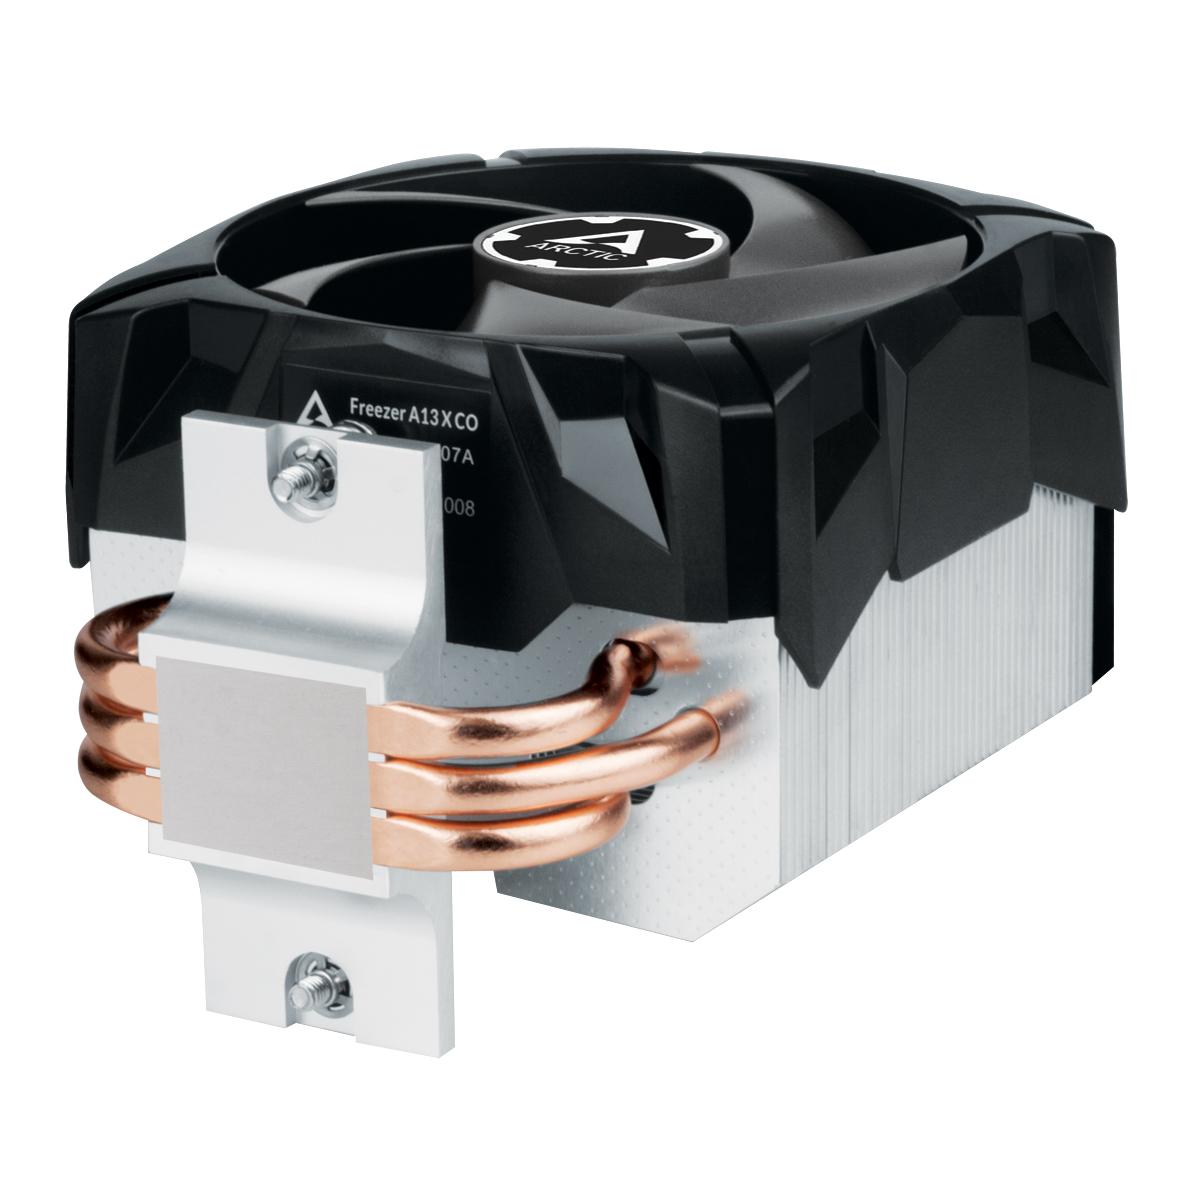 Freezer A13 X  CO